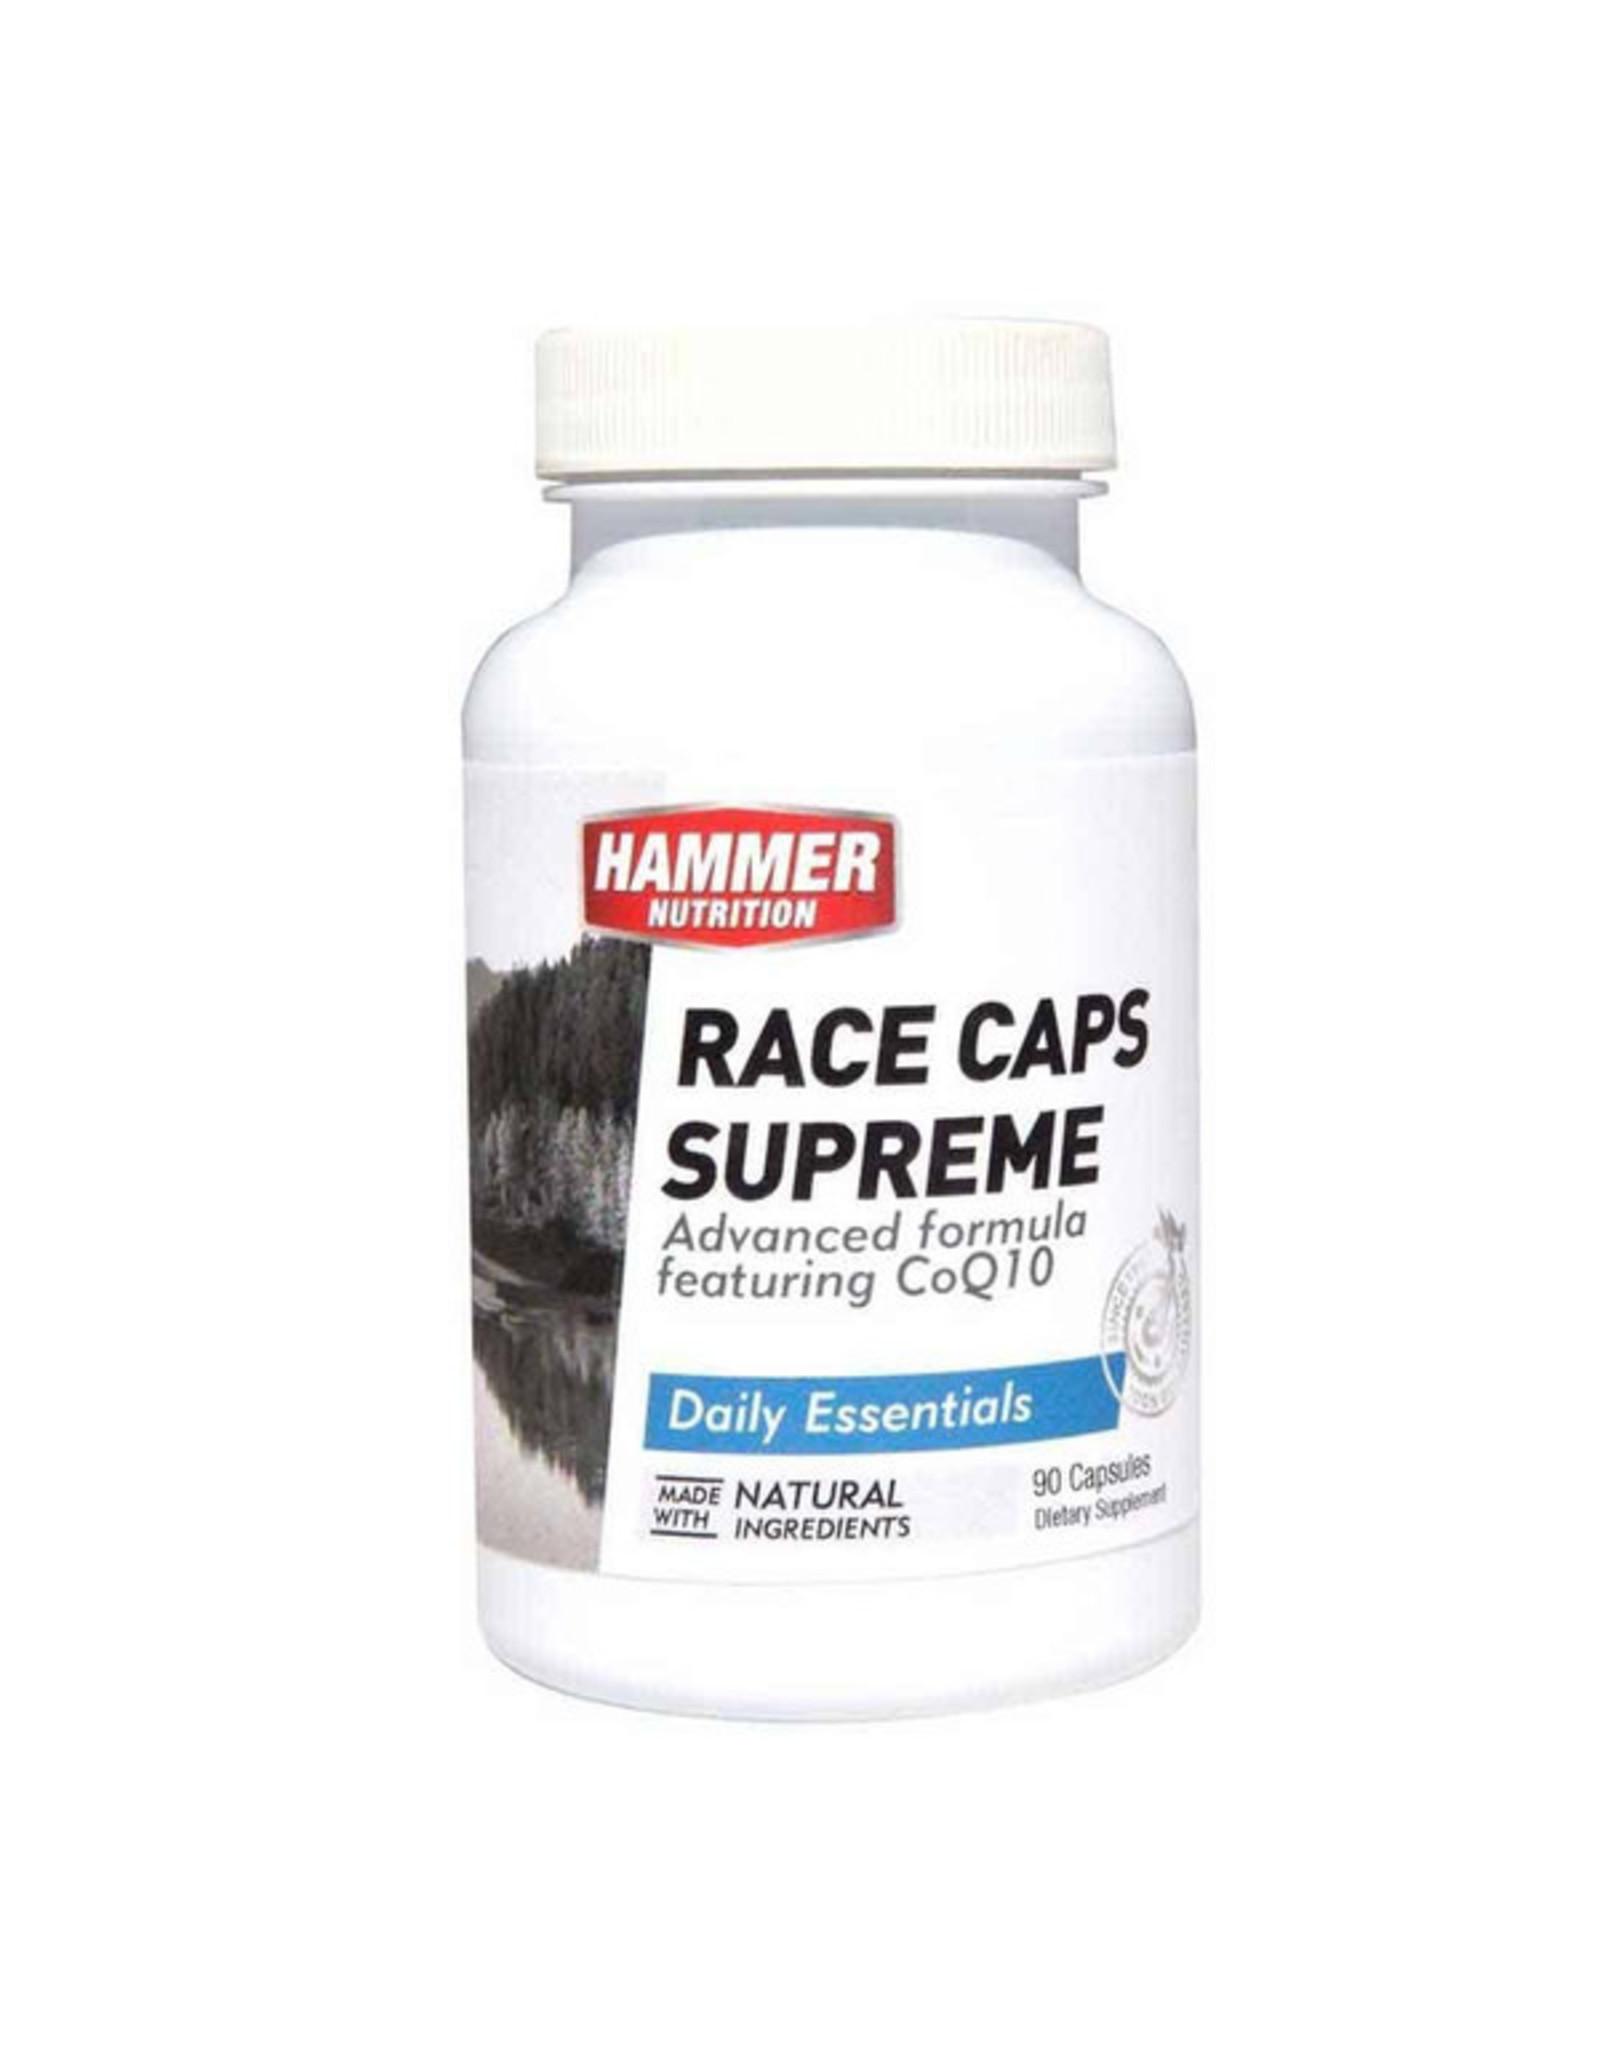 Hammer Nutrition Hammer Nutrition Race Caps Supreme (90 Cap)